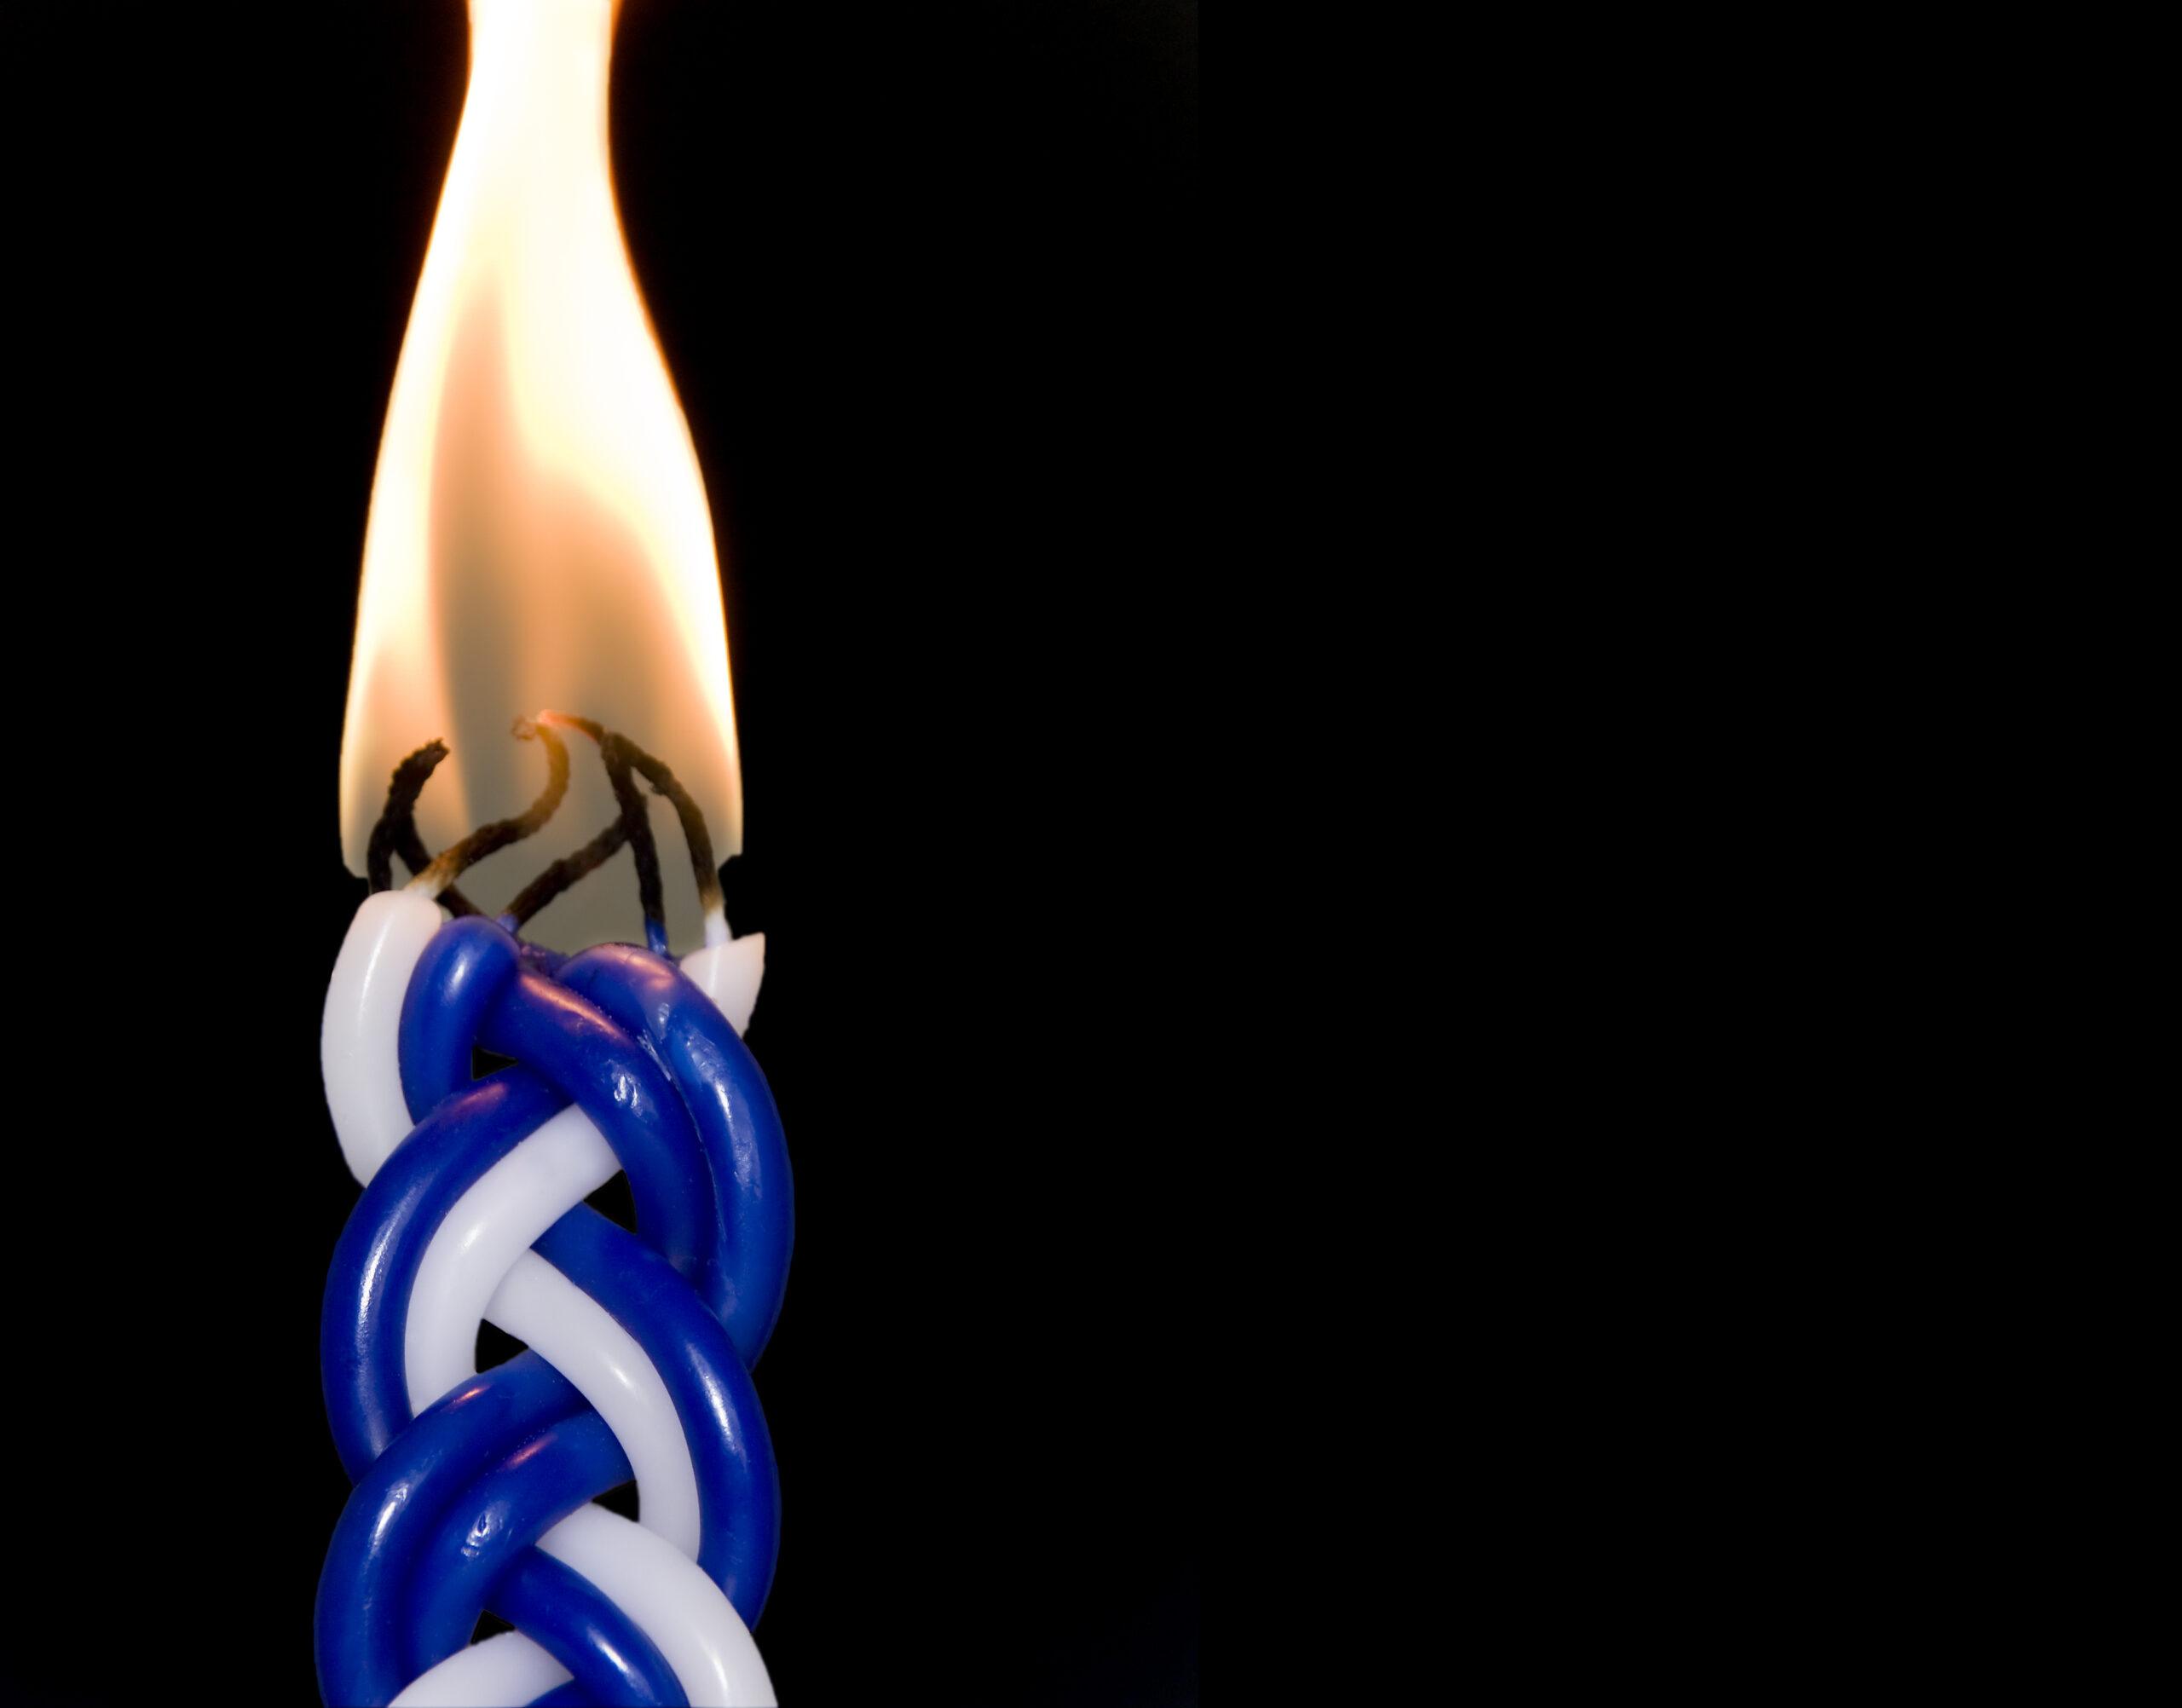 Havdallah candle